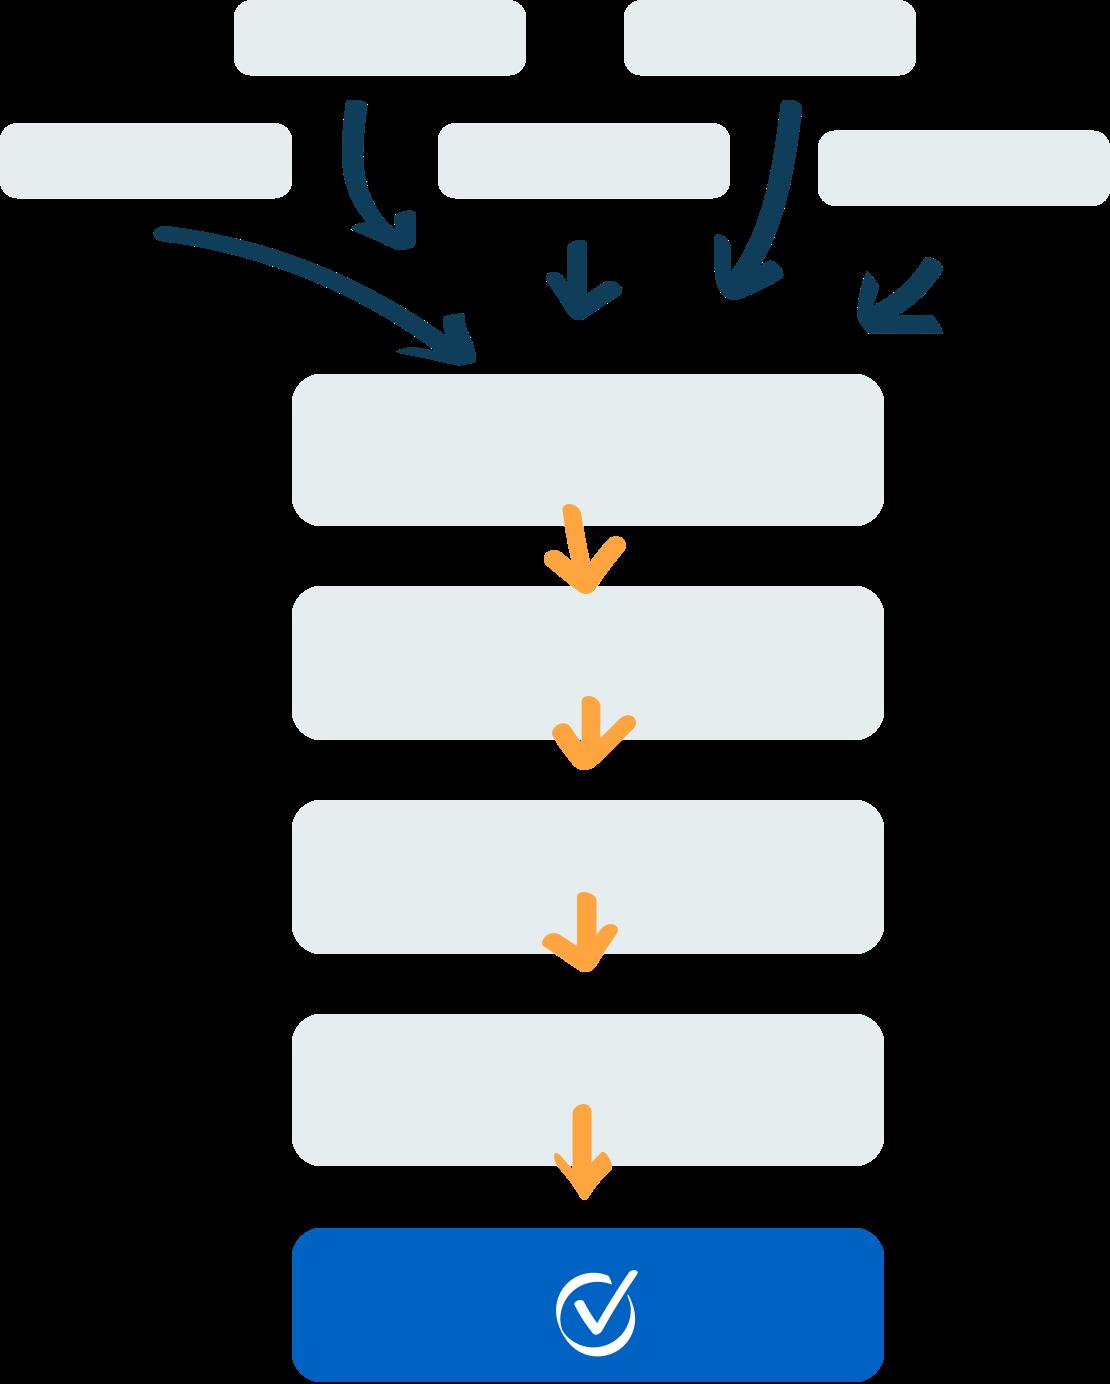 illustration of streamlined workflow diagram